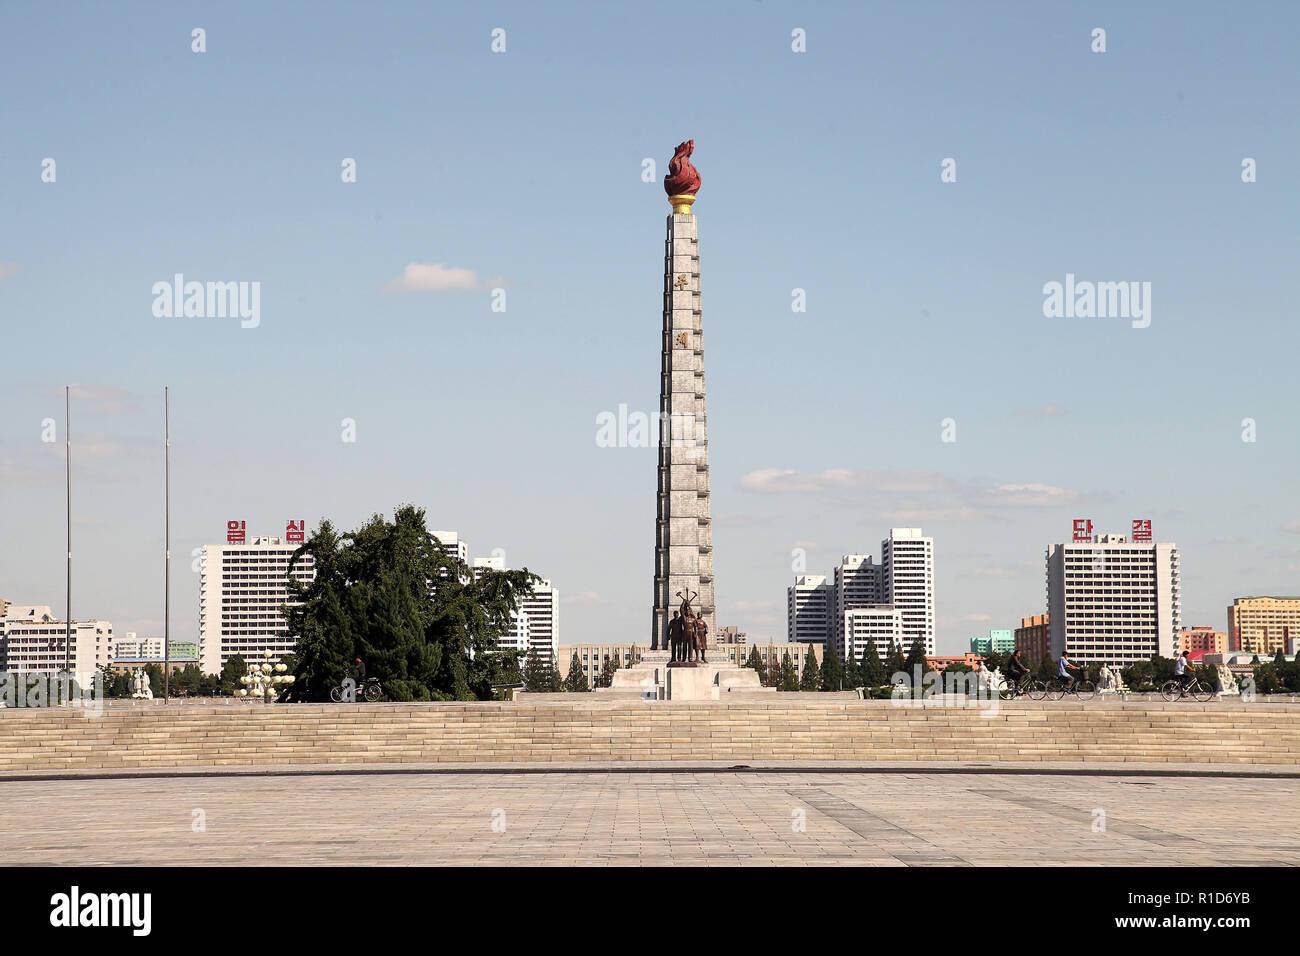 Juche Tower at Pyongyang in North Korea - Stock Image